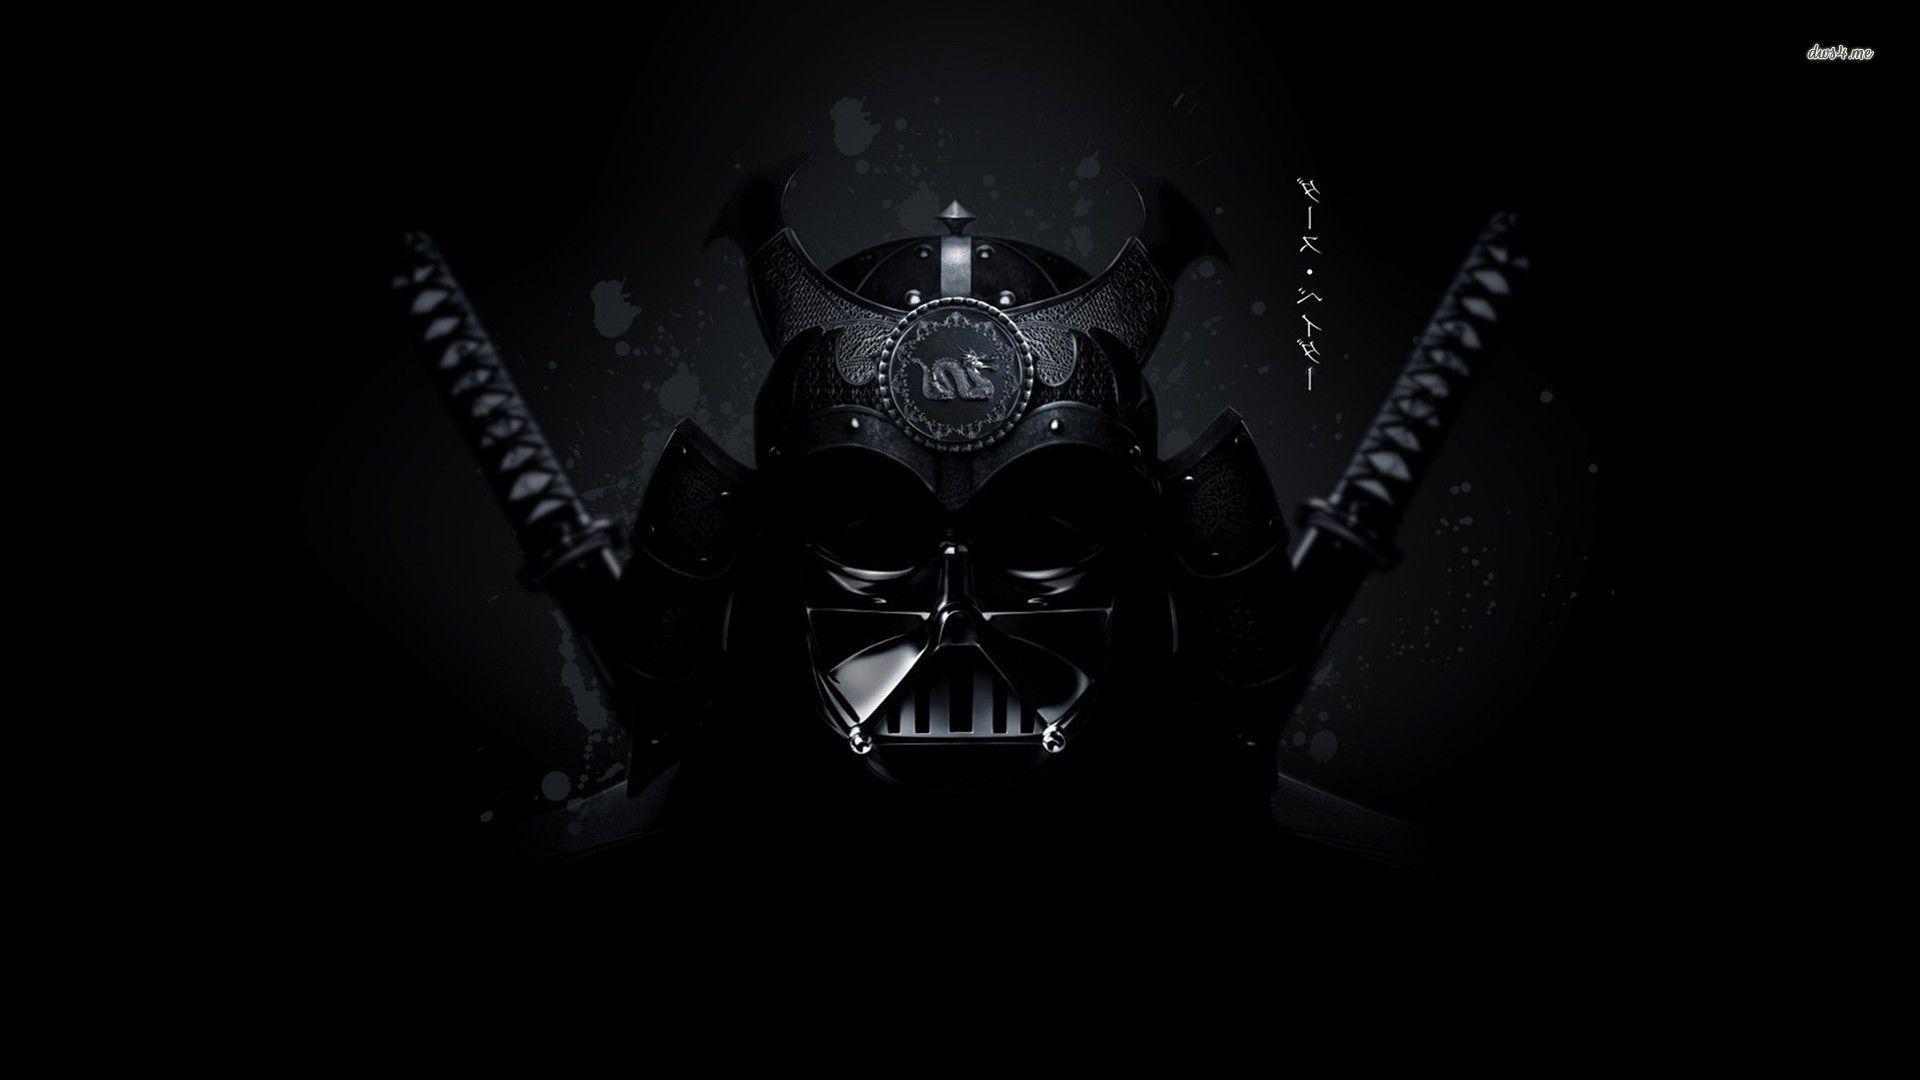 Samurai Darth Vader samurai art Pinterest Samurai